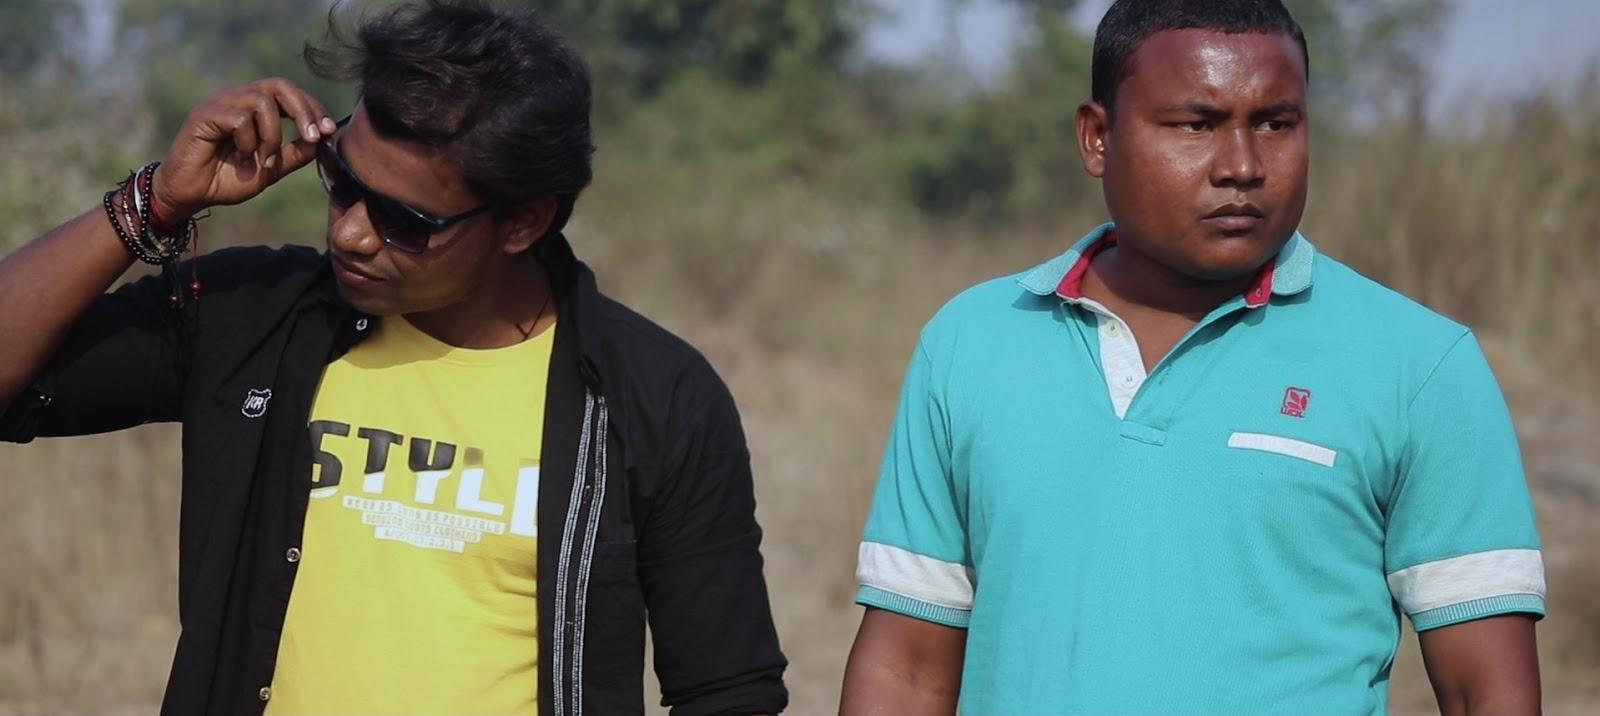 RAKA Hindi Movie   Asansol Film   Asansol Film Industry Writer, Director ,Producer - Dhananjay Mukherjee Asansol Film and Music Asansol FILM